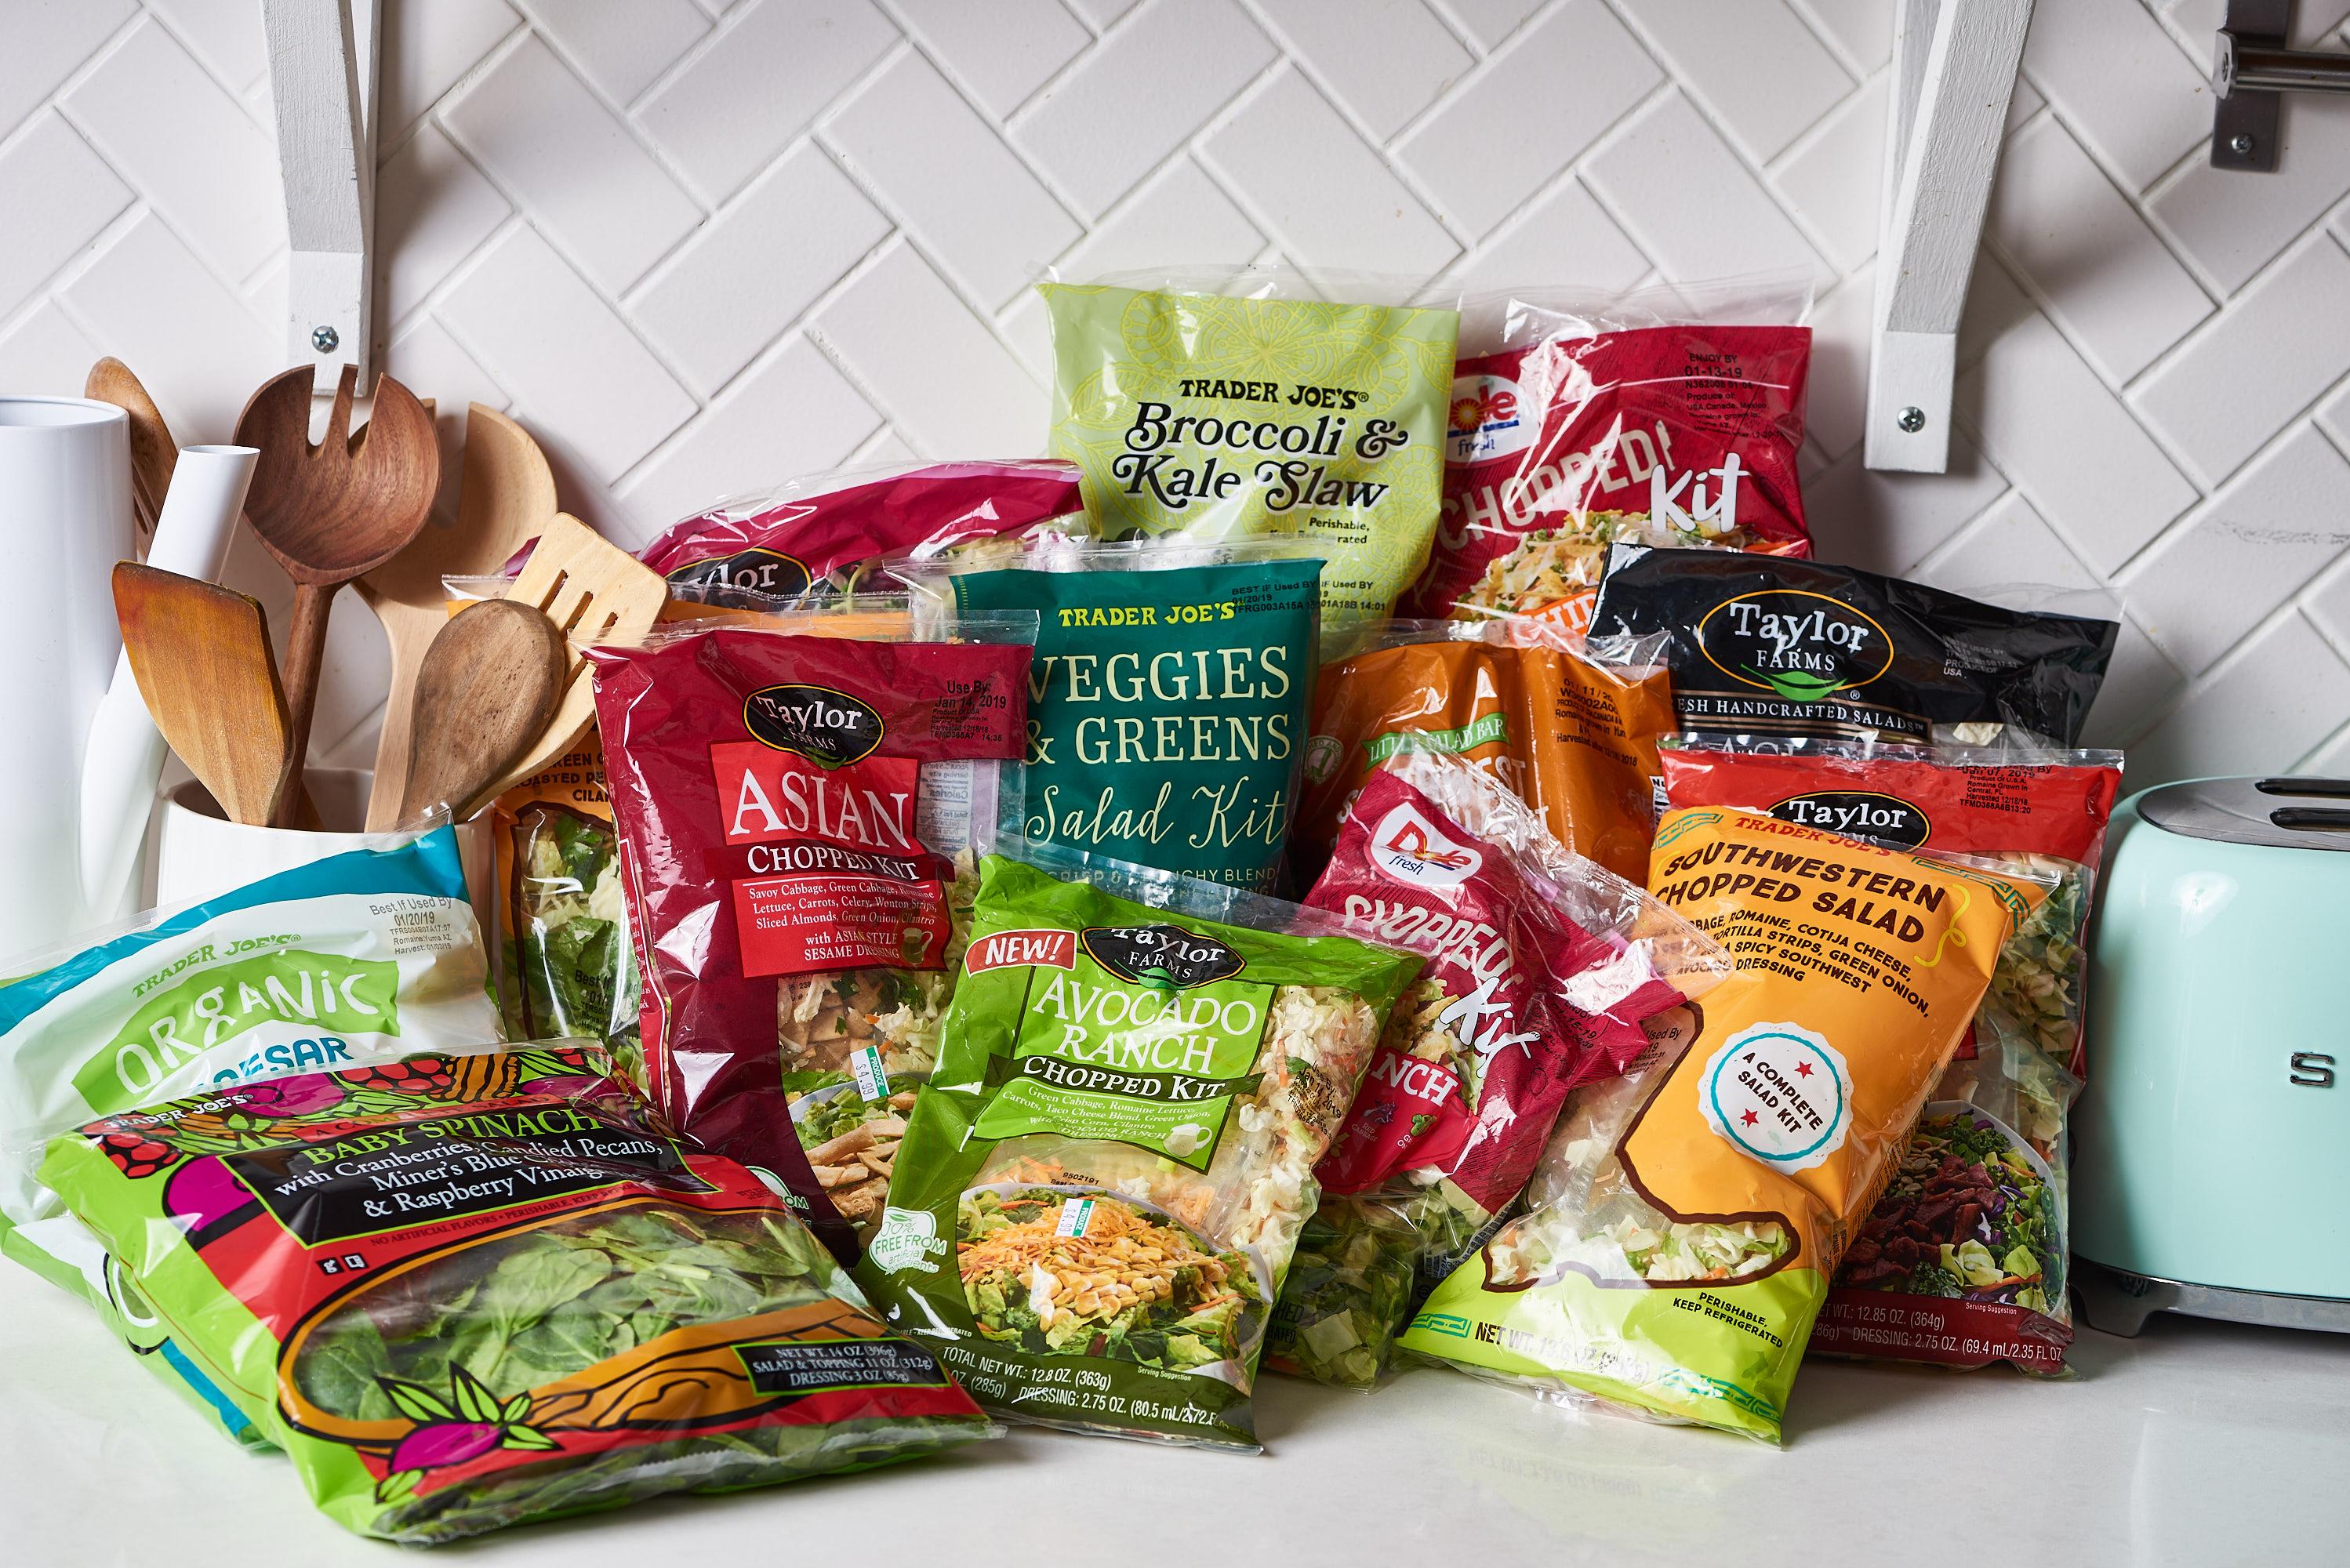 Best Salad Kits - Dole, Earthbound Farms   Kitchn